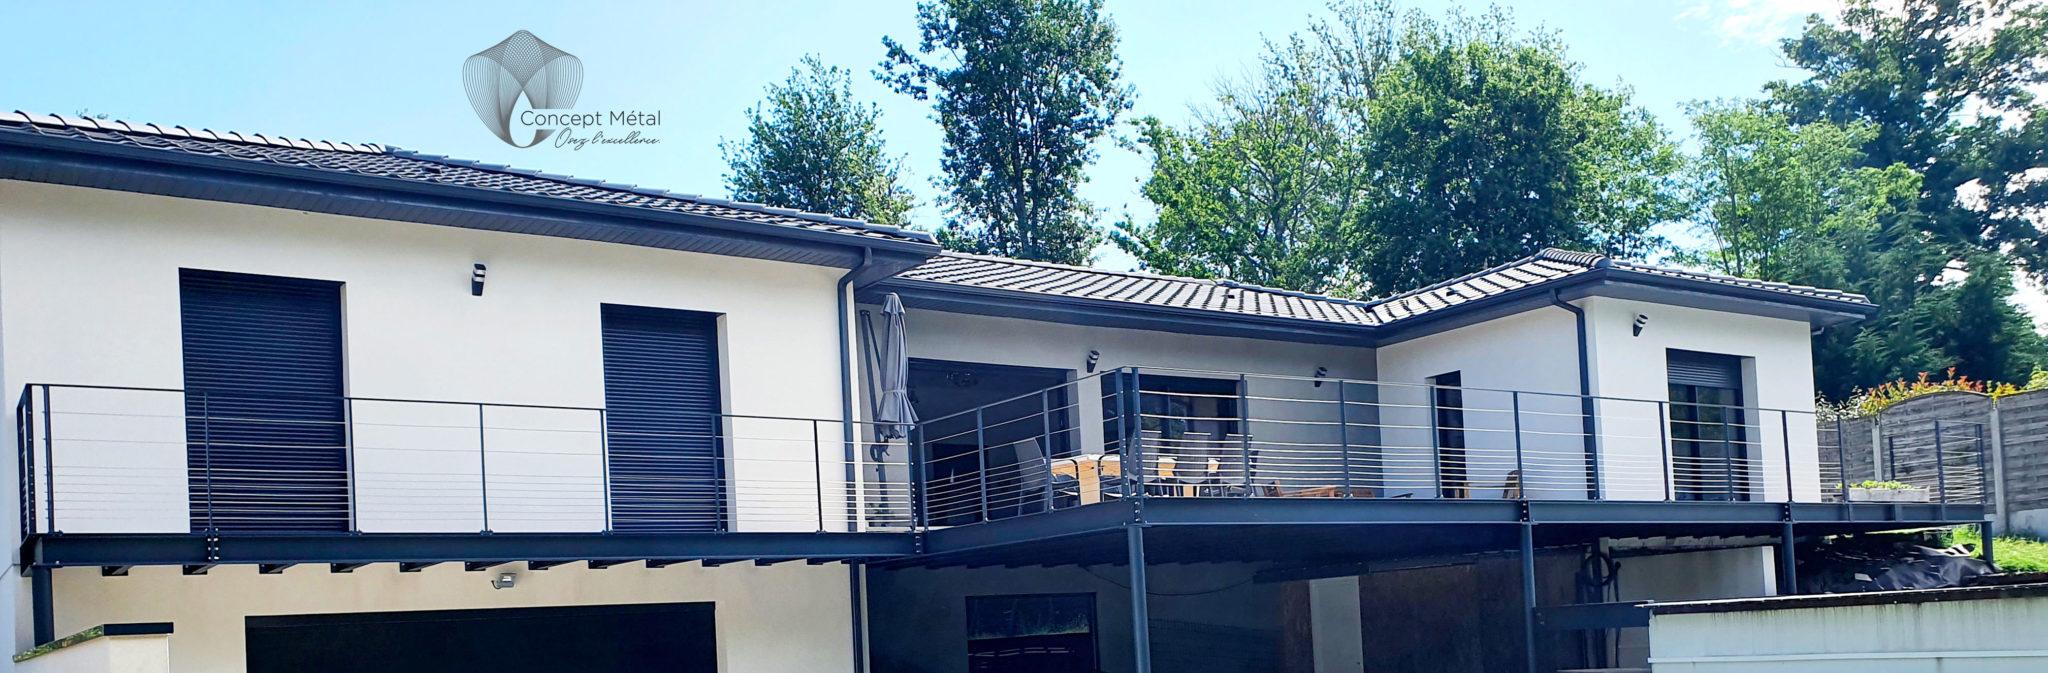 Pergola Terrasse - Concept Métal - Bordeaux - Bassin d'Arcachon